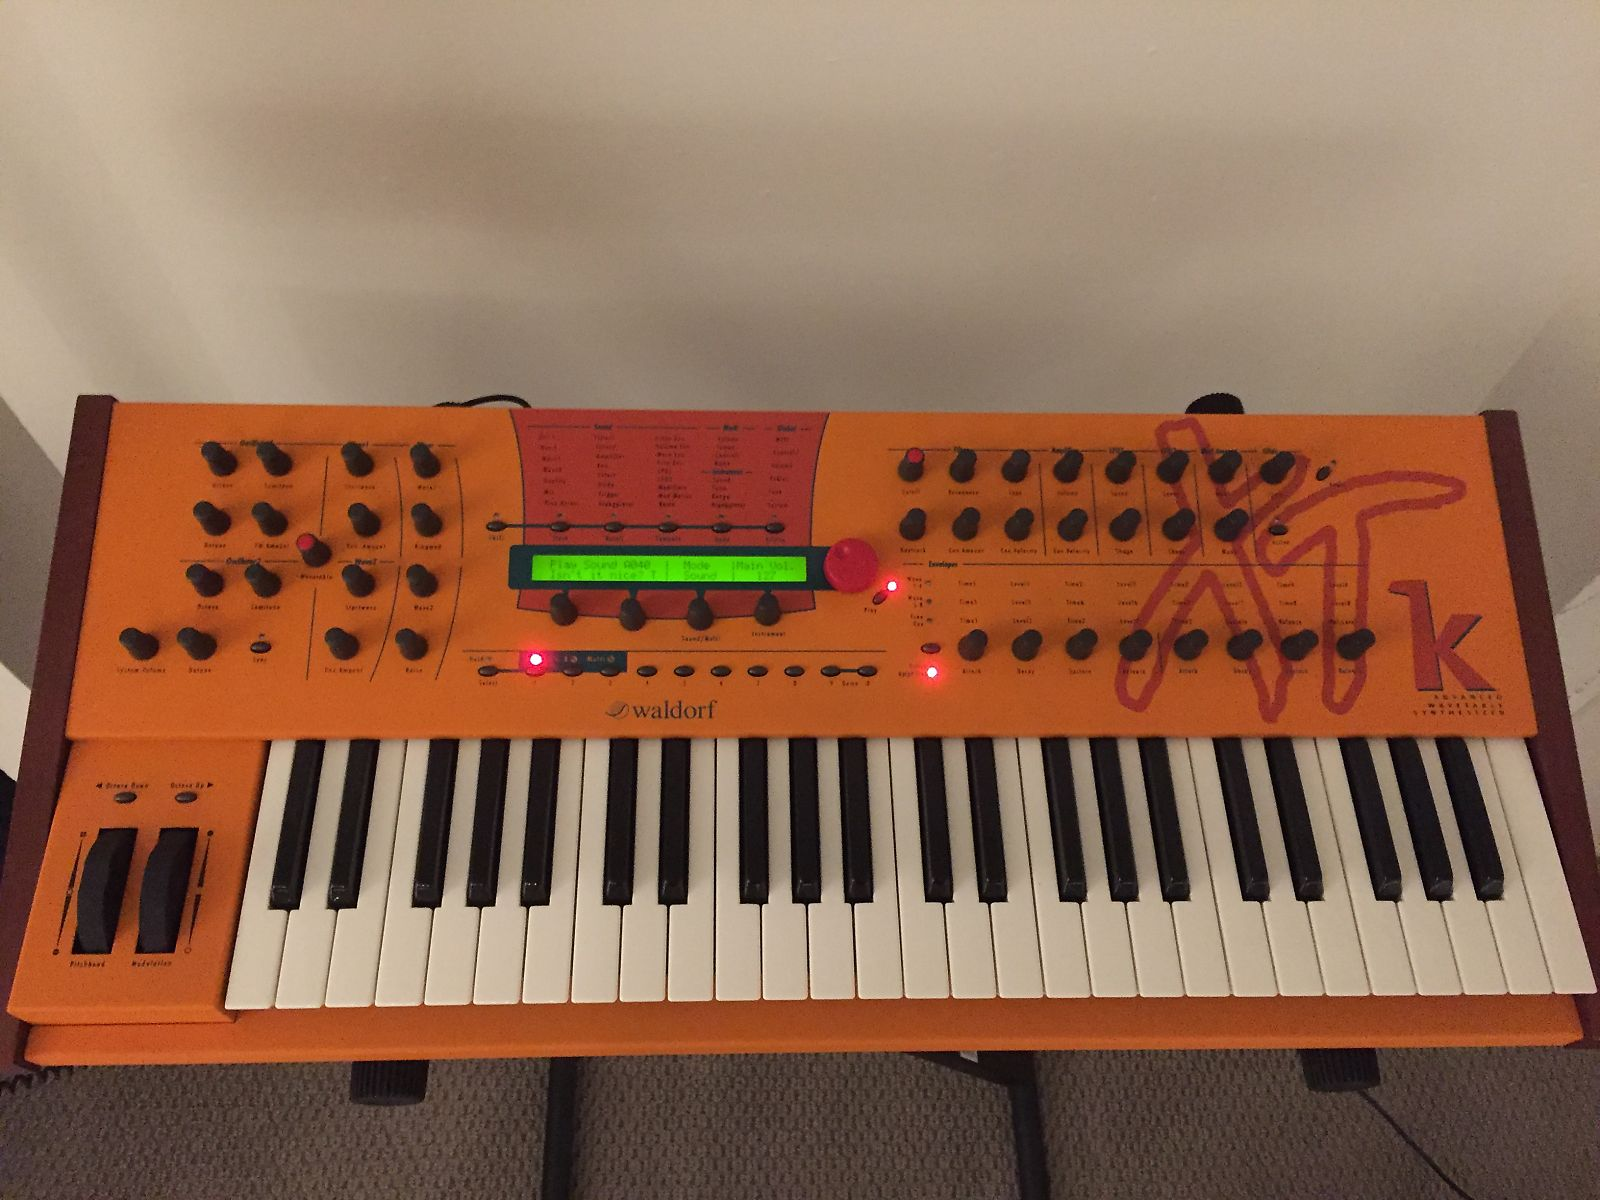 waldorf microwave xtk wavetable synthesizer reverb. Black Bedroom Furniture Sets. Home Design Ideas